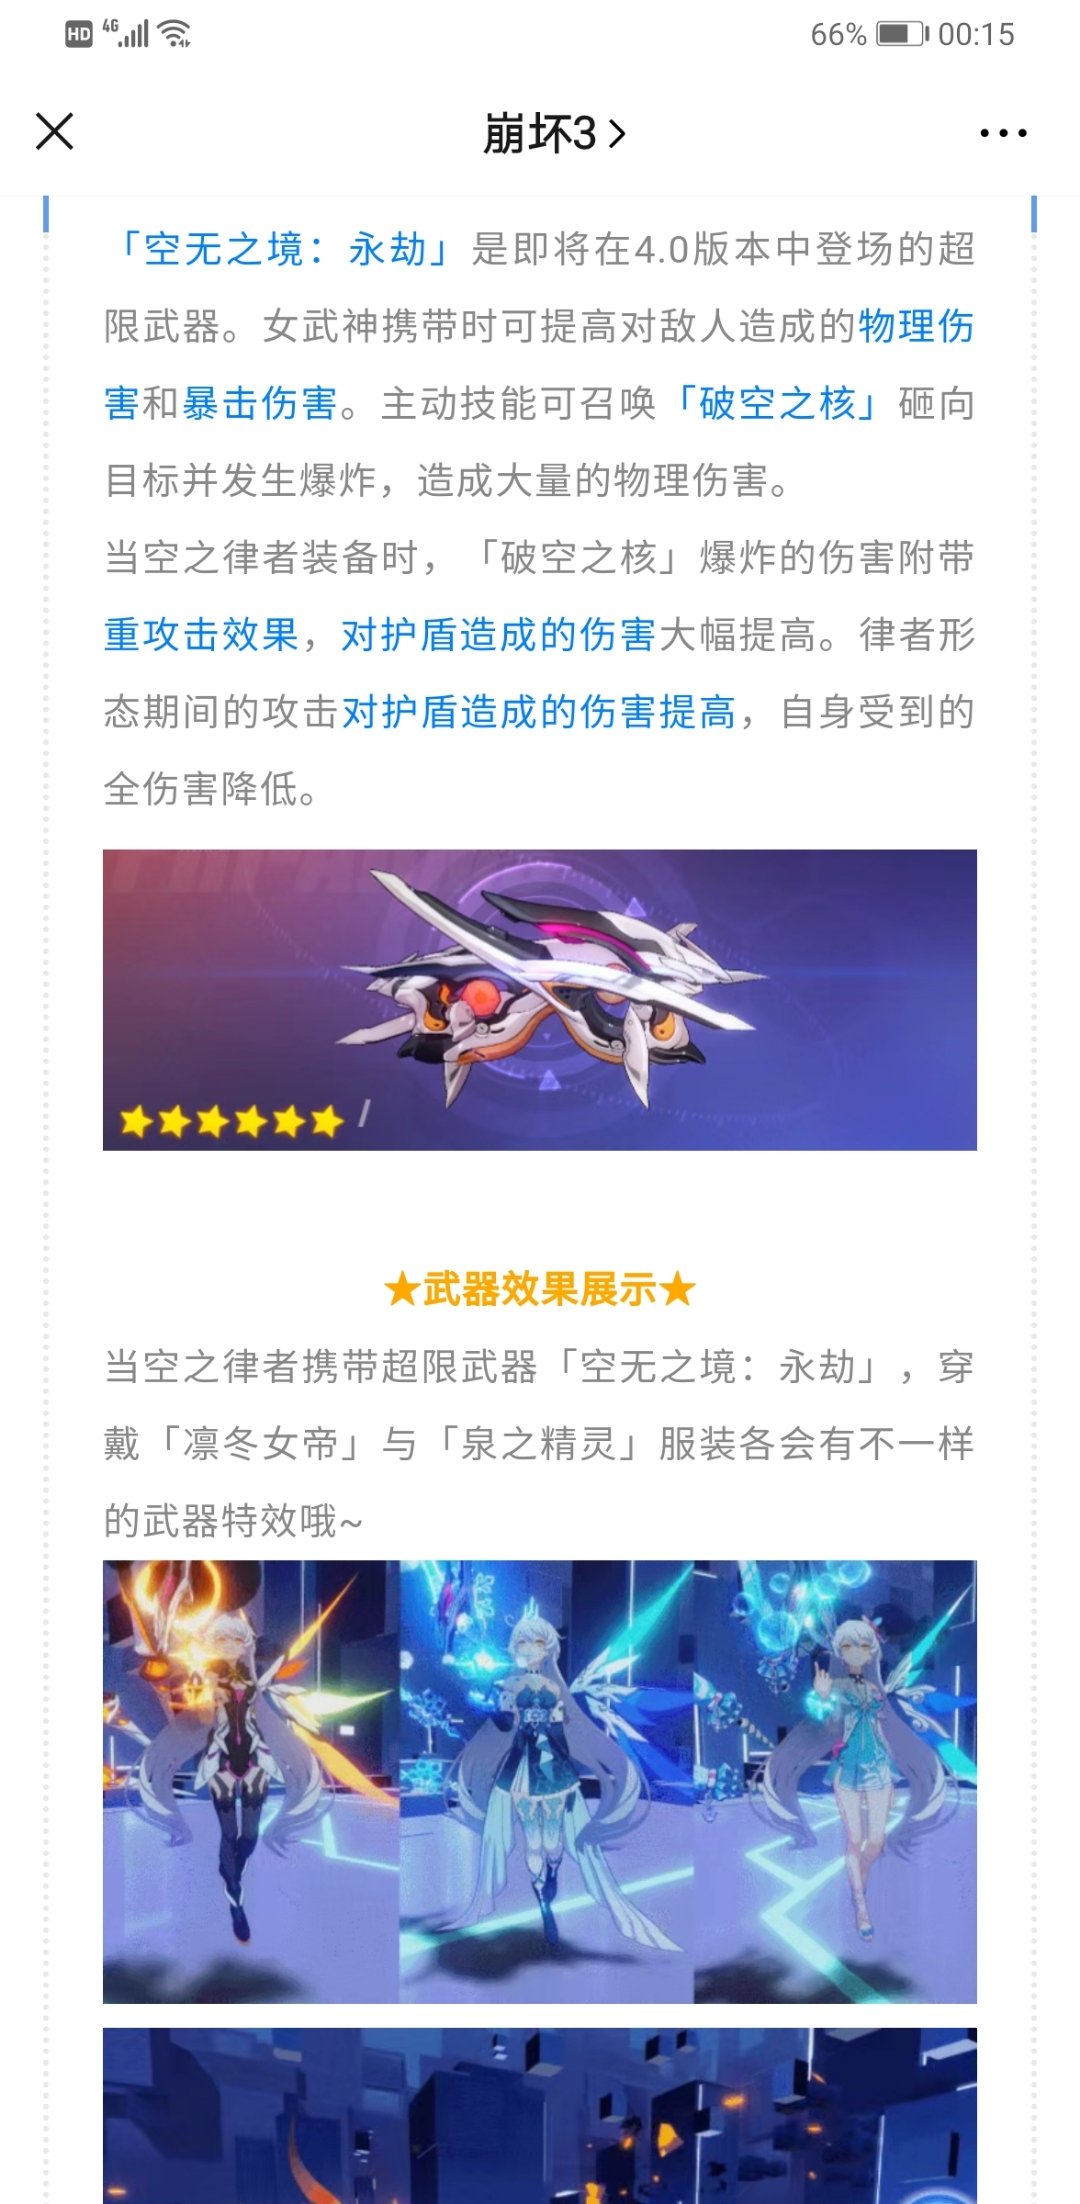 Screenshot_20200509_001501_com.tencent.mm.jpg